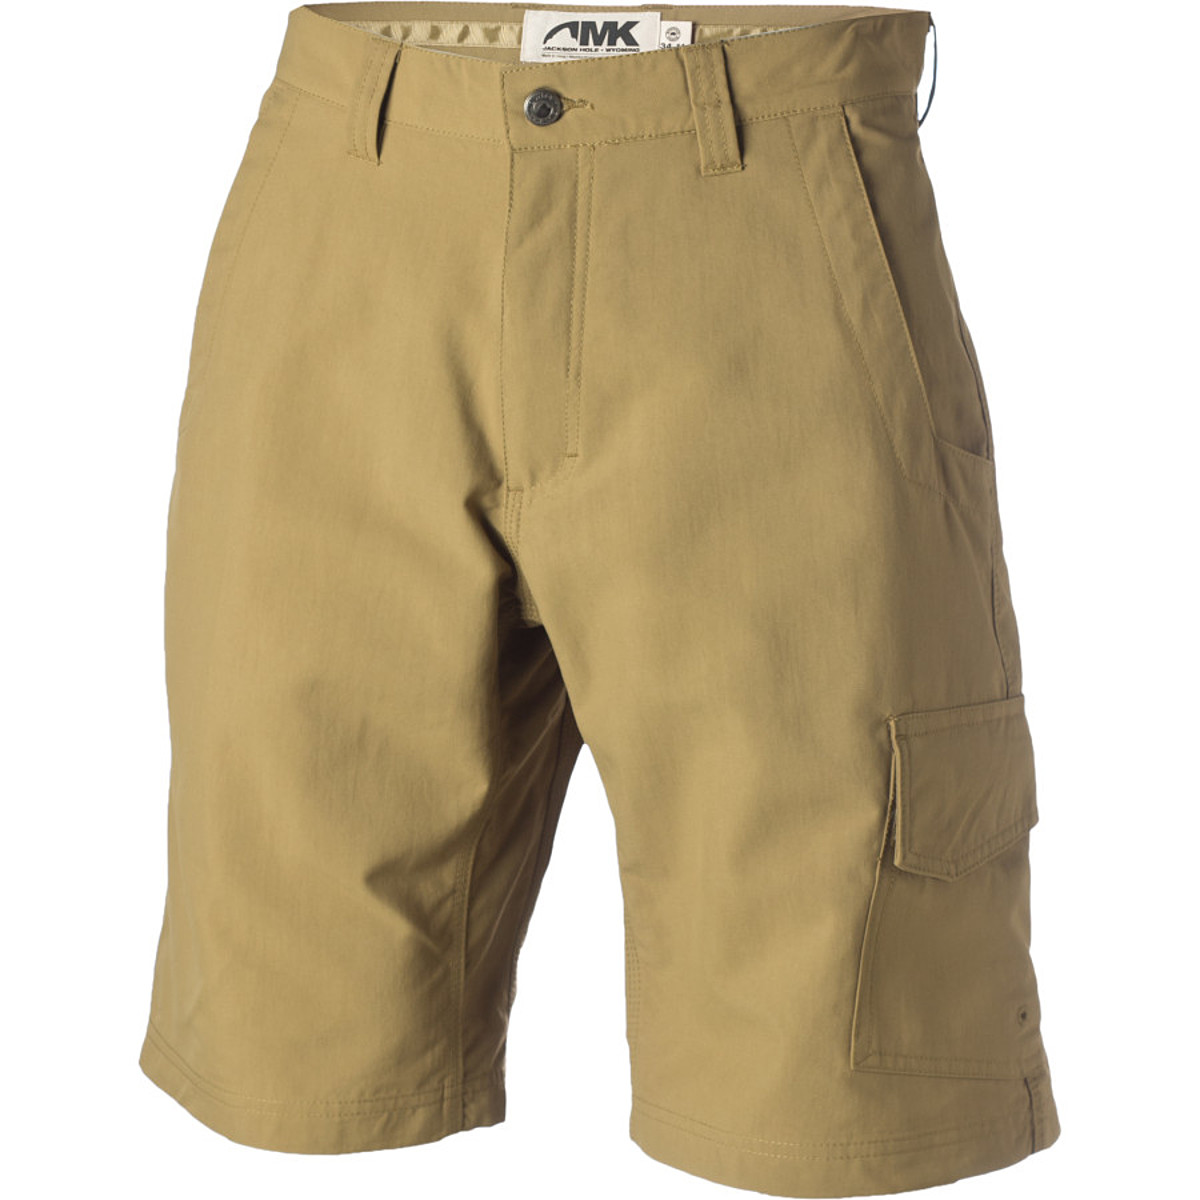 photo of a Mountain Khakis short/skirt